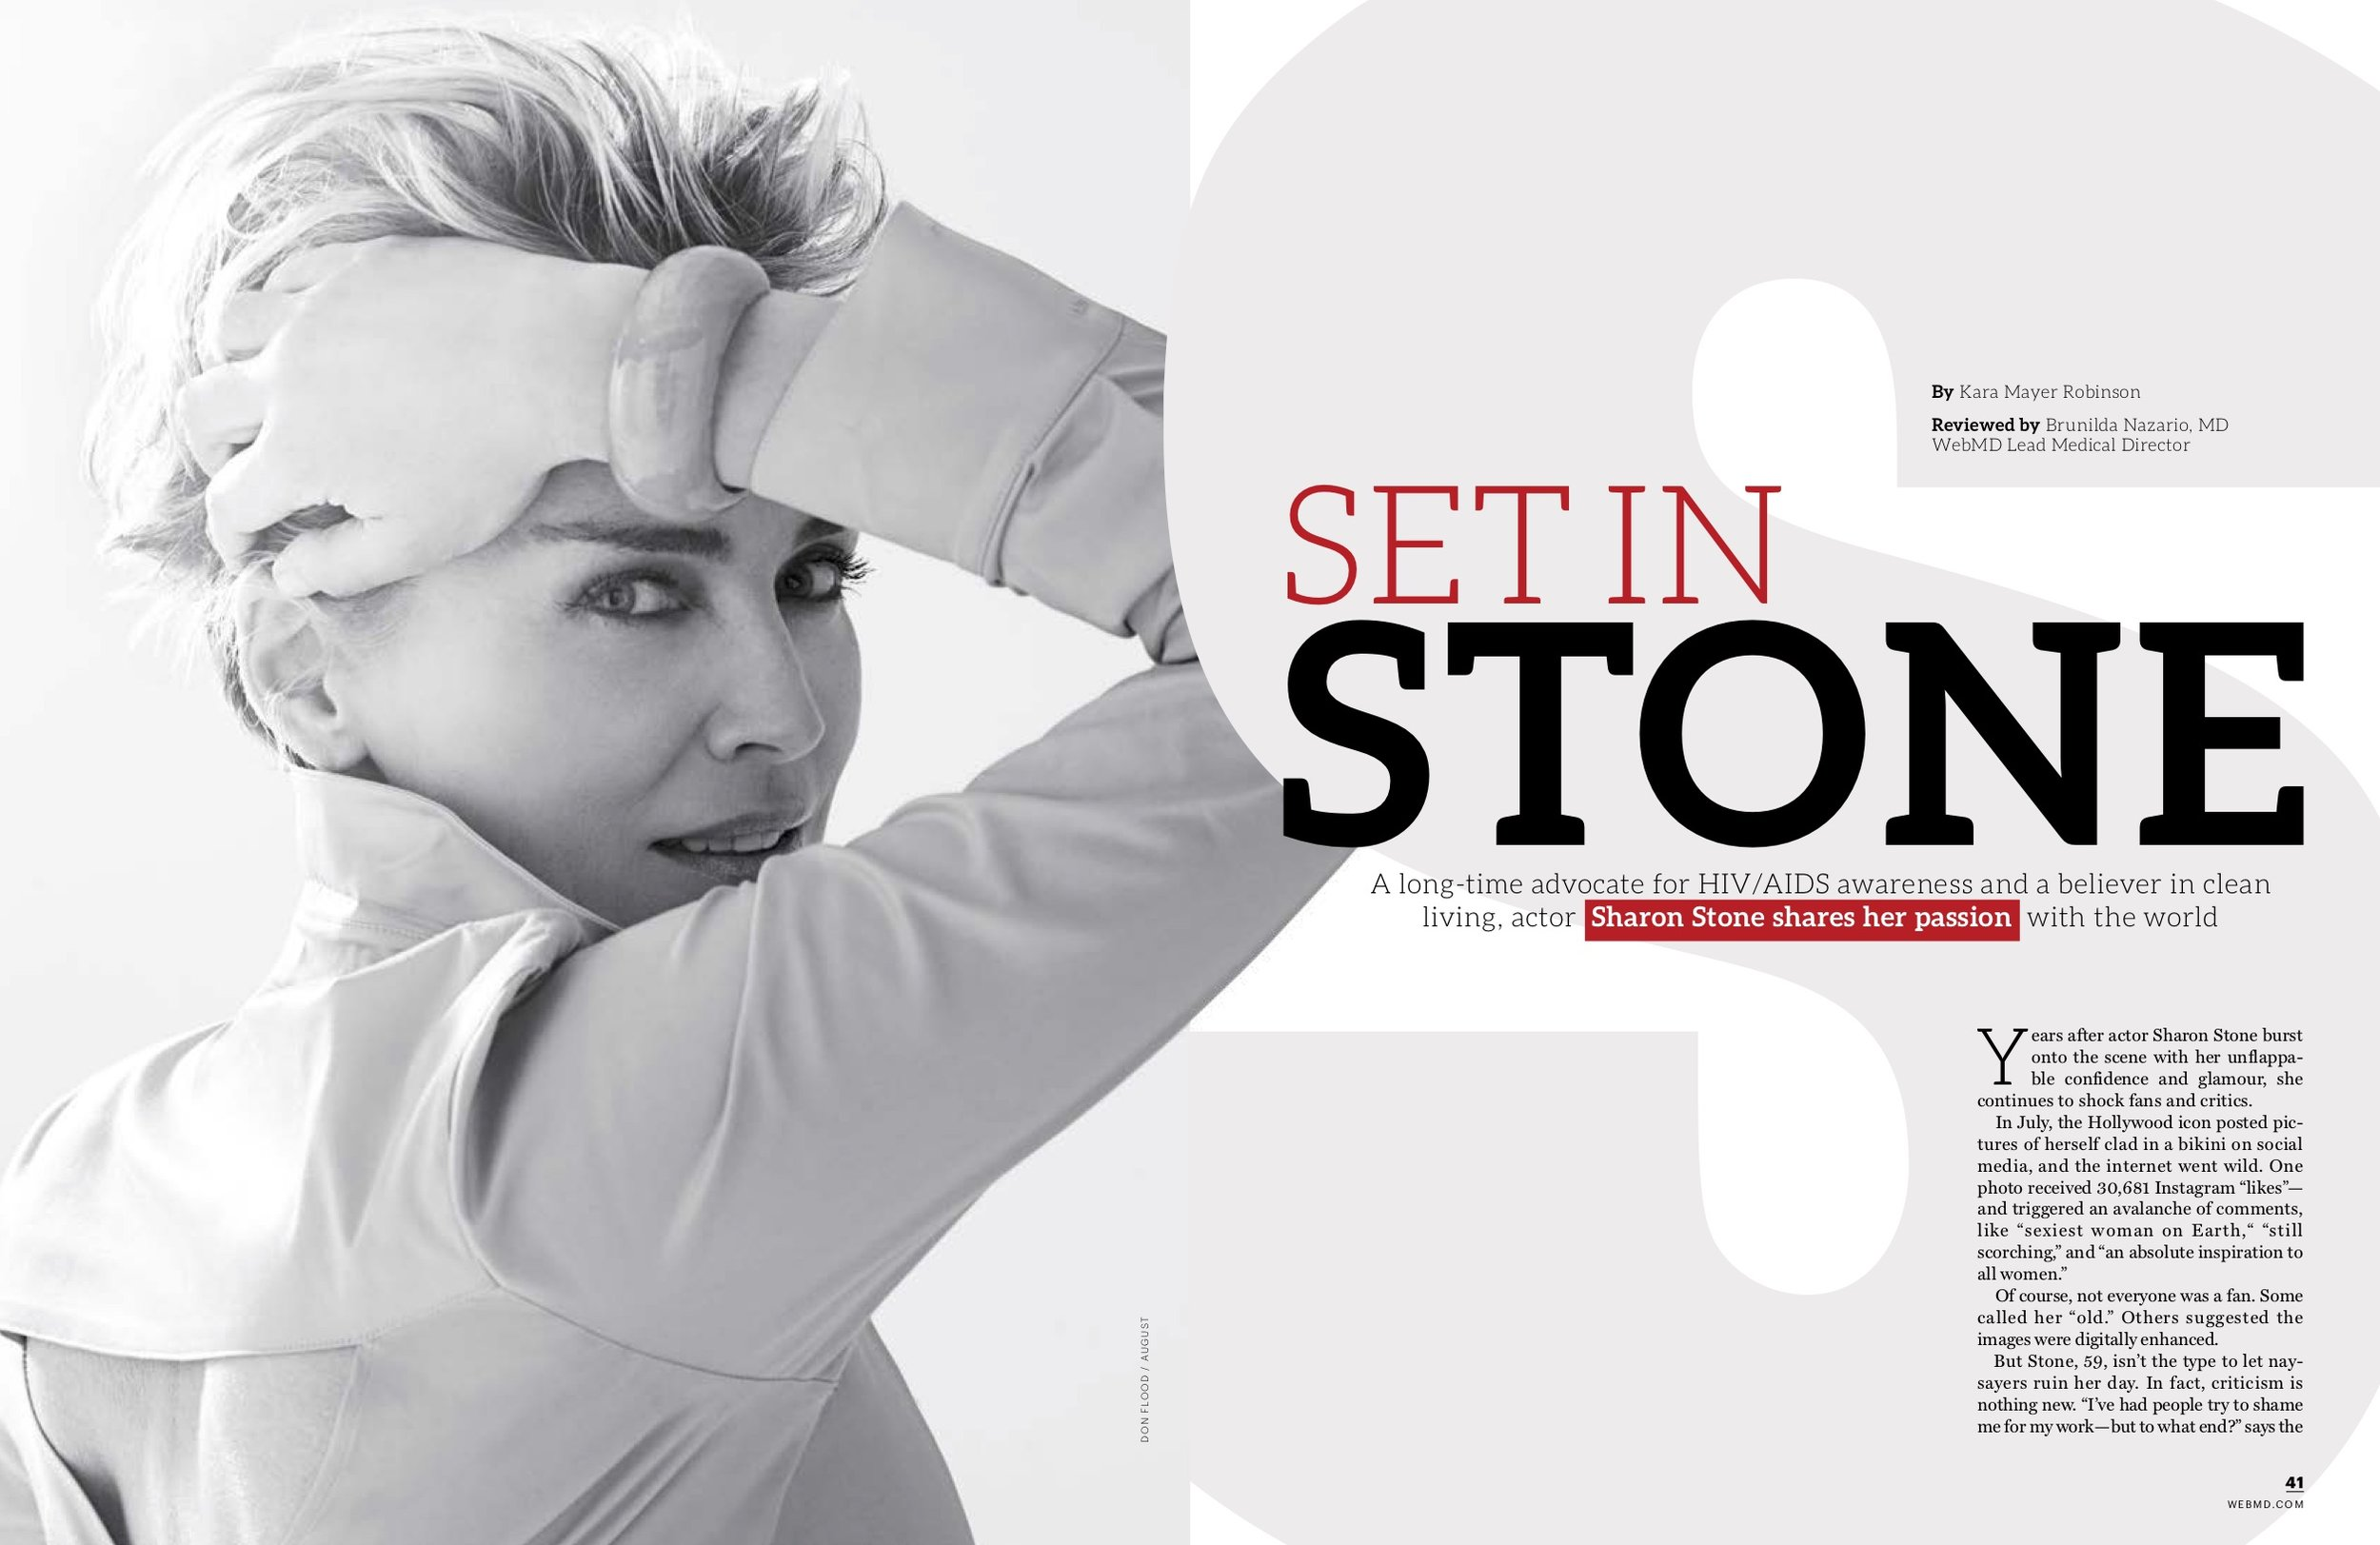 Sharon Stone JPEG 3.jpg